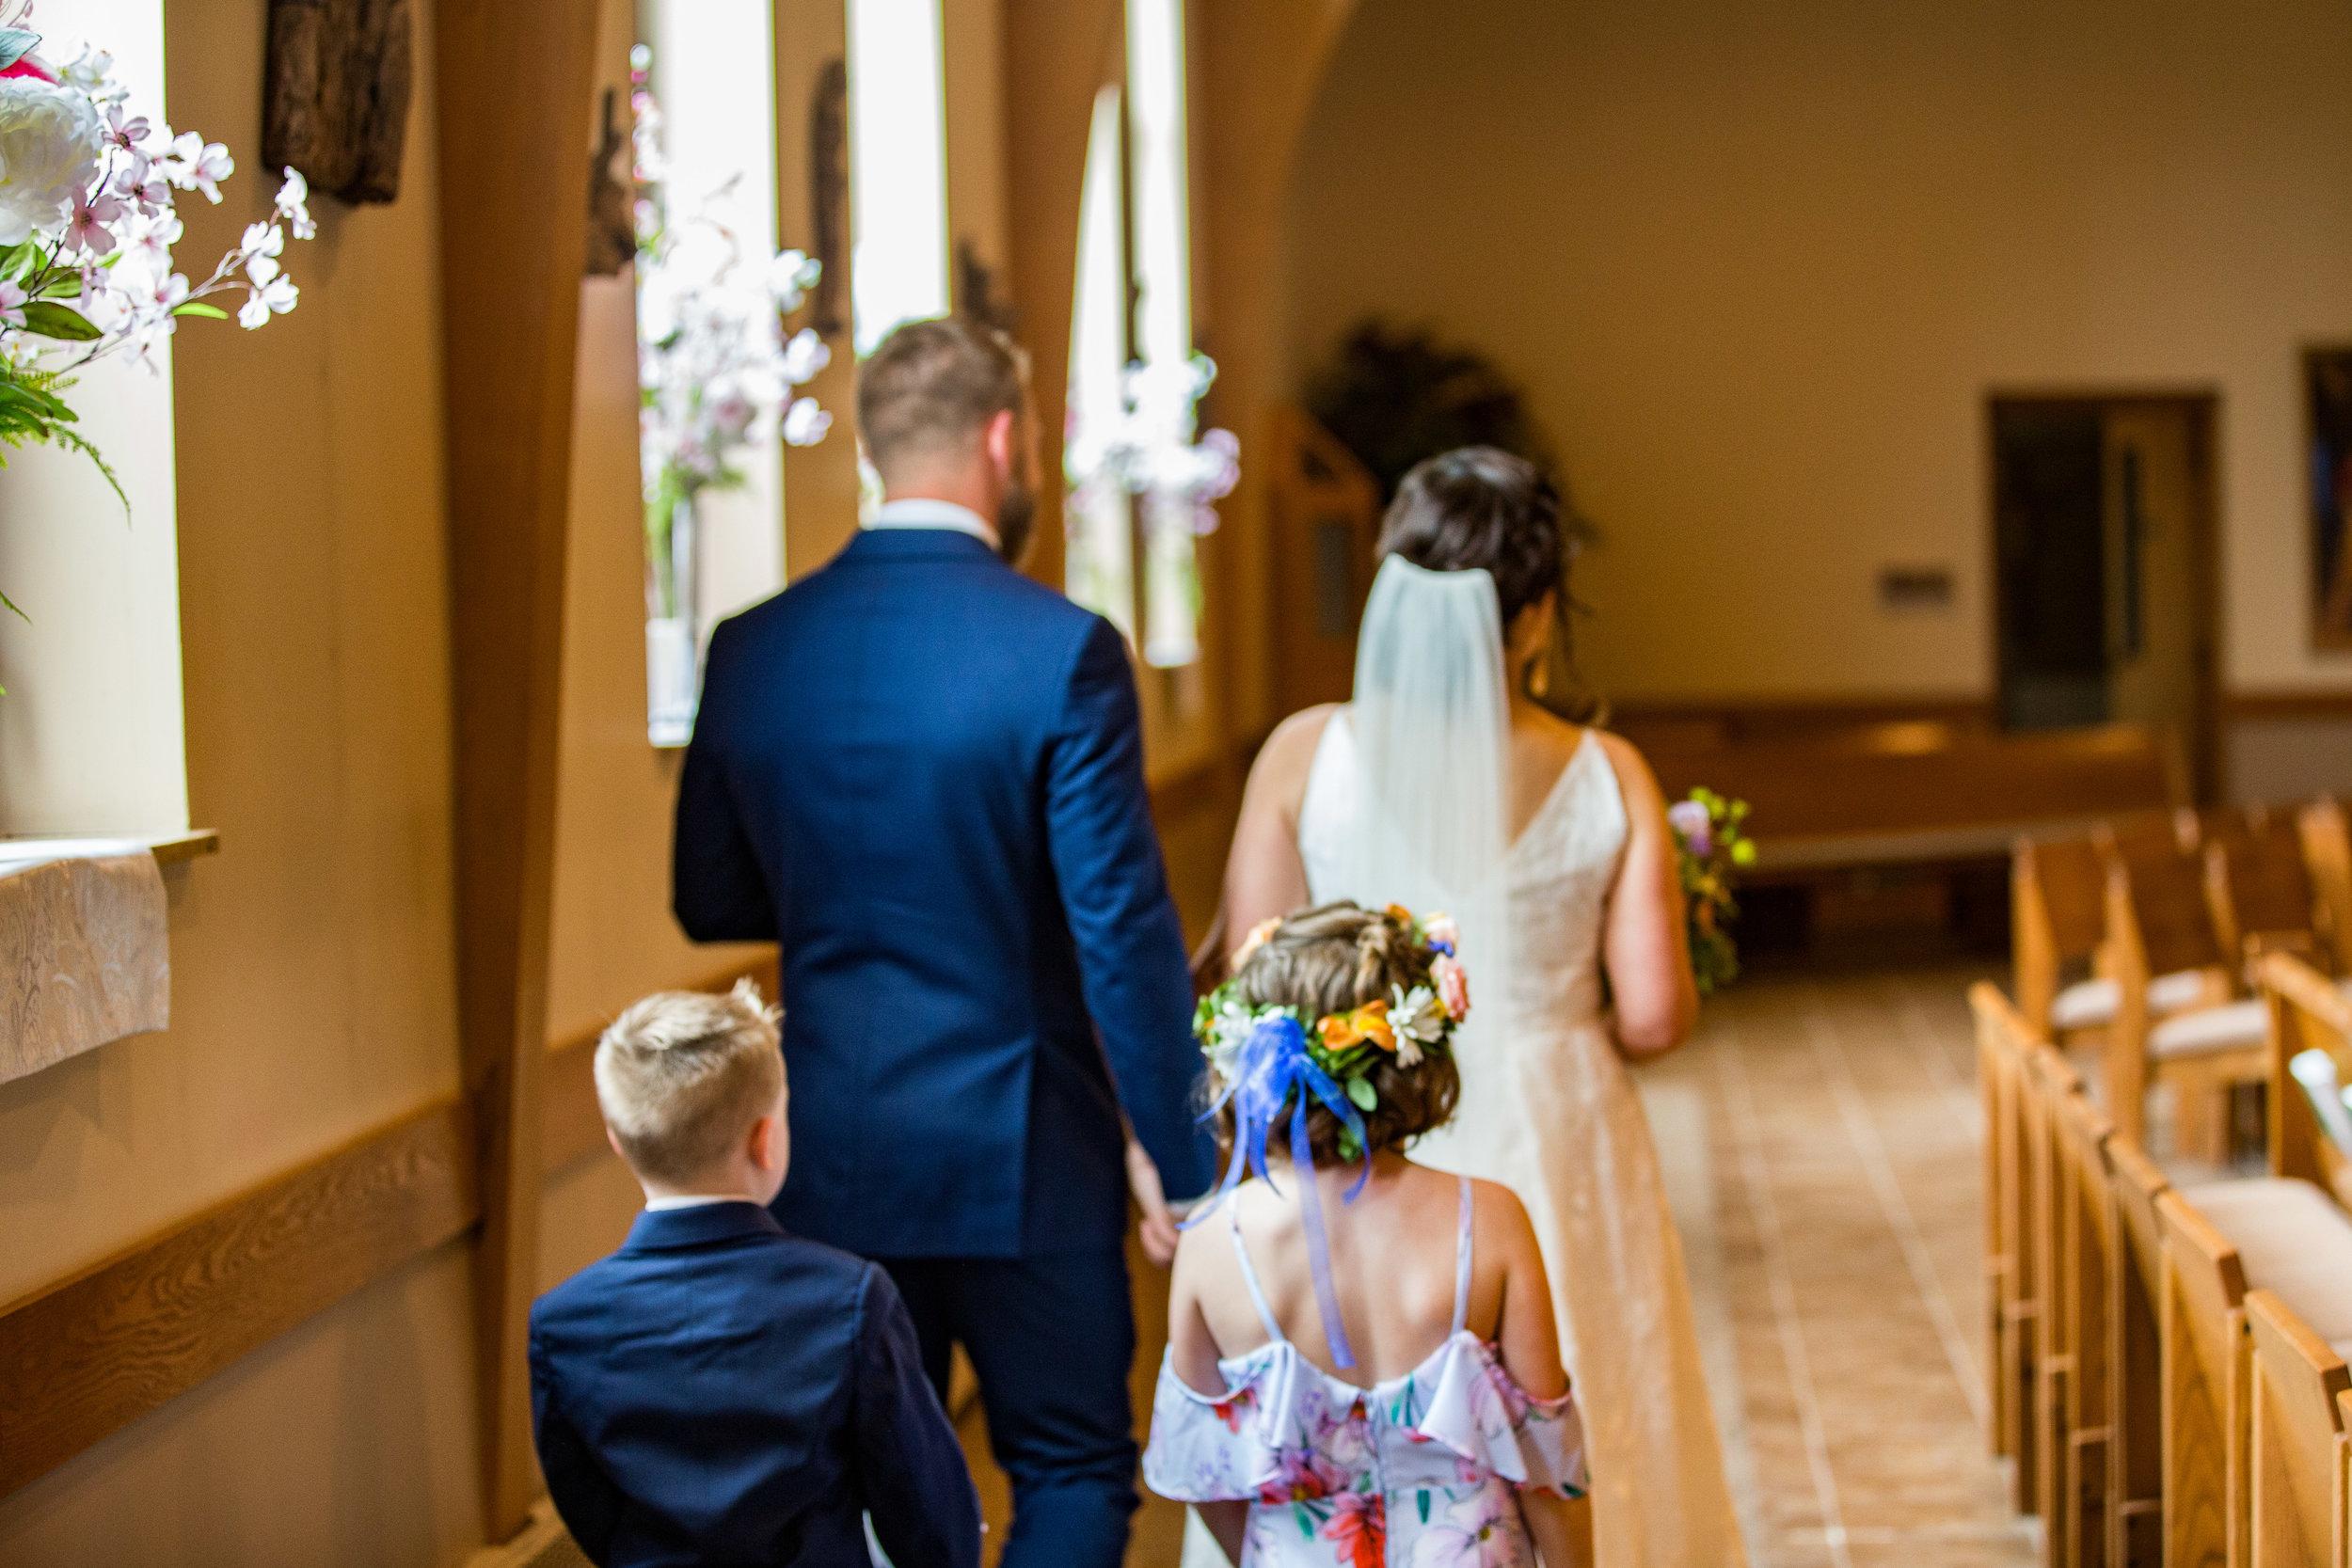 Natalie and Dallas Mooney Wedding 6-8-19_Tania Watt Photography-153.jpg